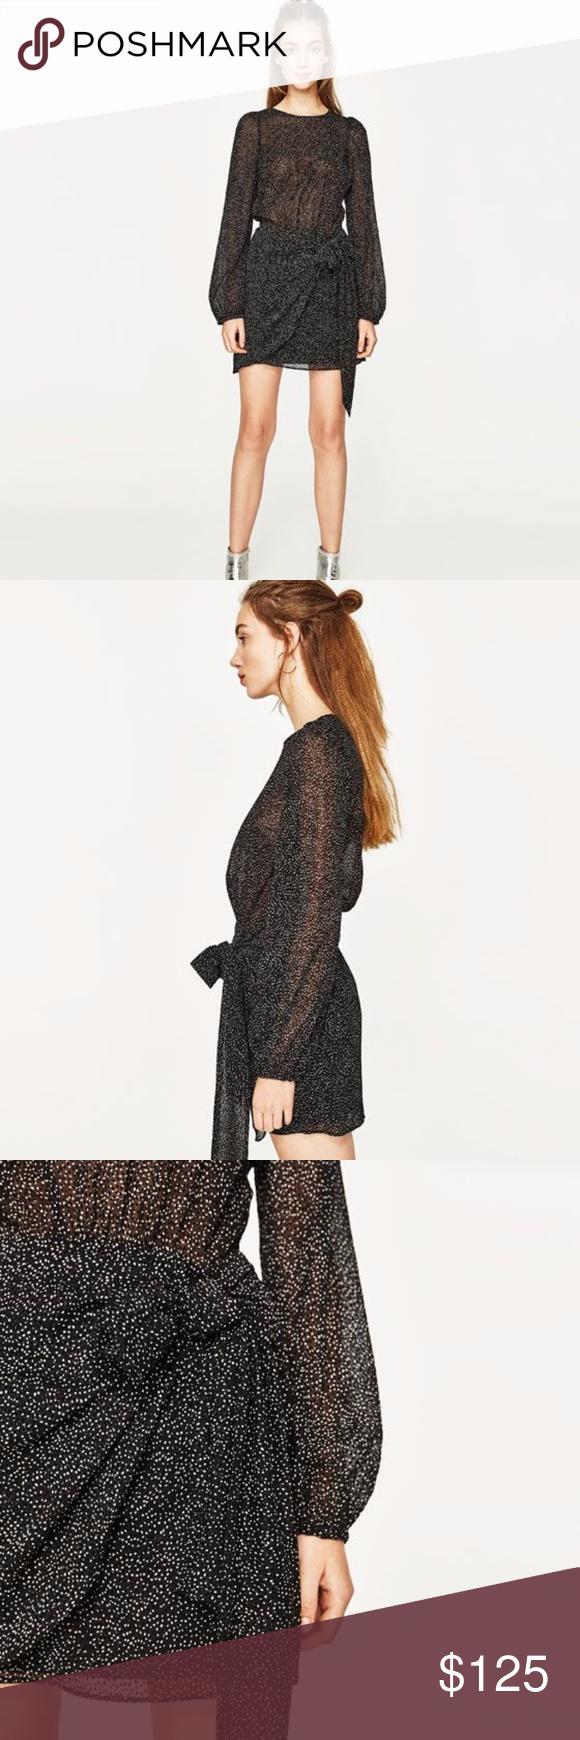 dfdd5b3e ZARA Crossover Polka Dot Knot Semi Sheer Dress S New without tag Zara  Dresses Mini